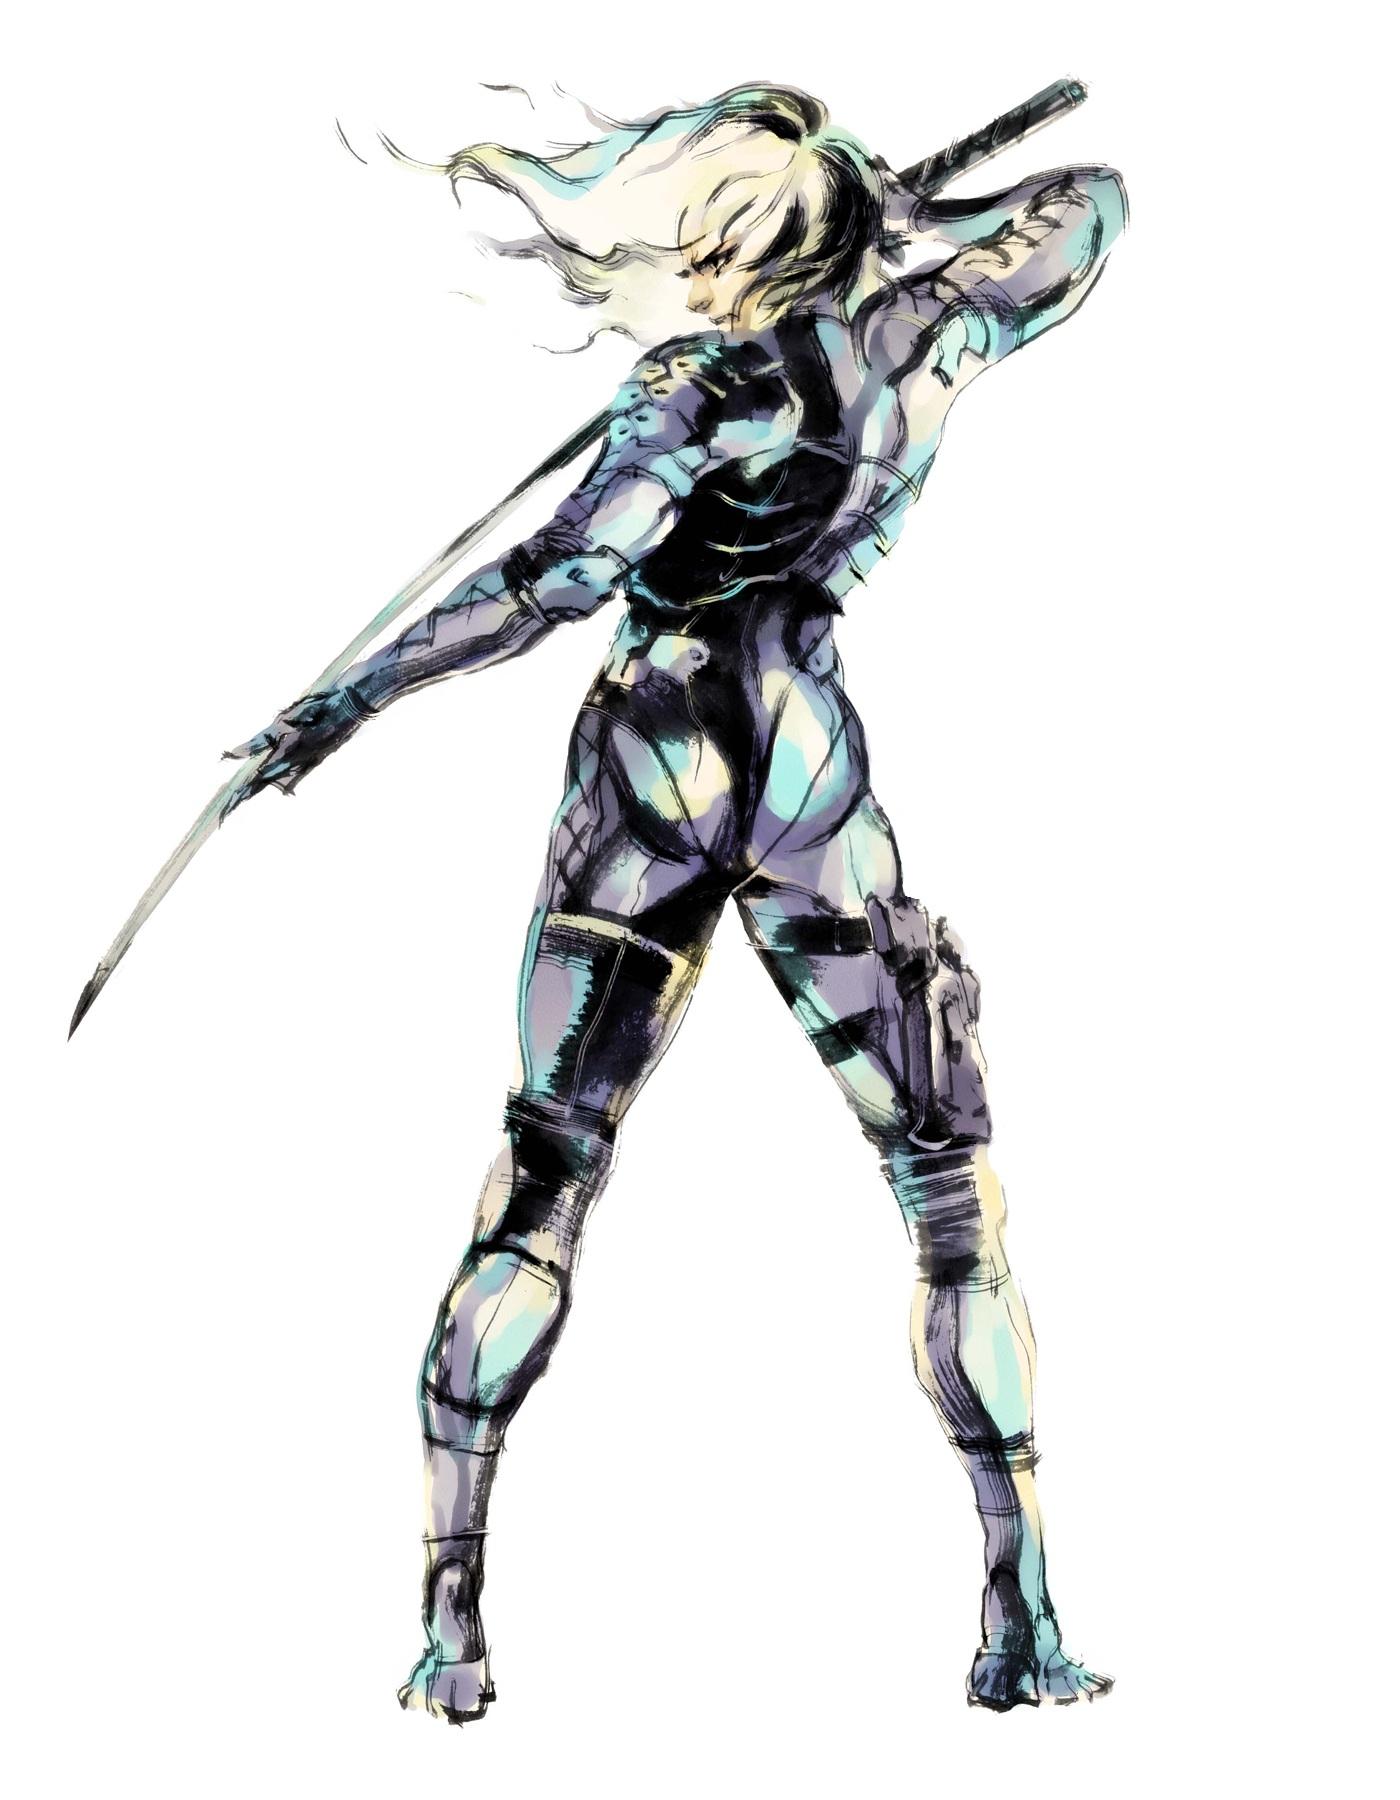 Metal Gear clipart #2, Download drawings